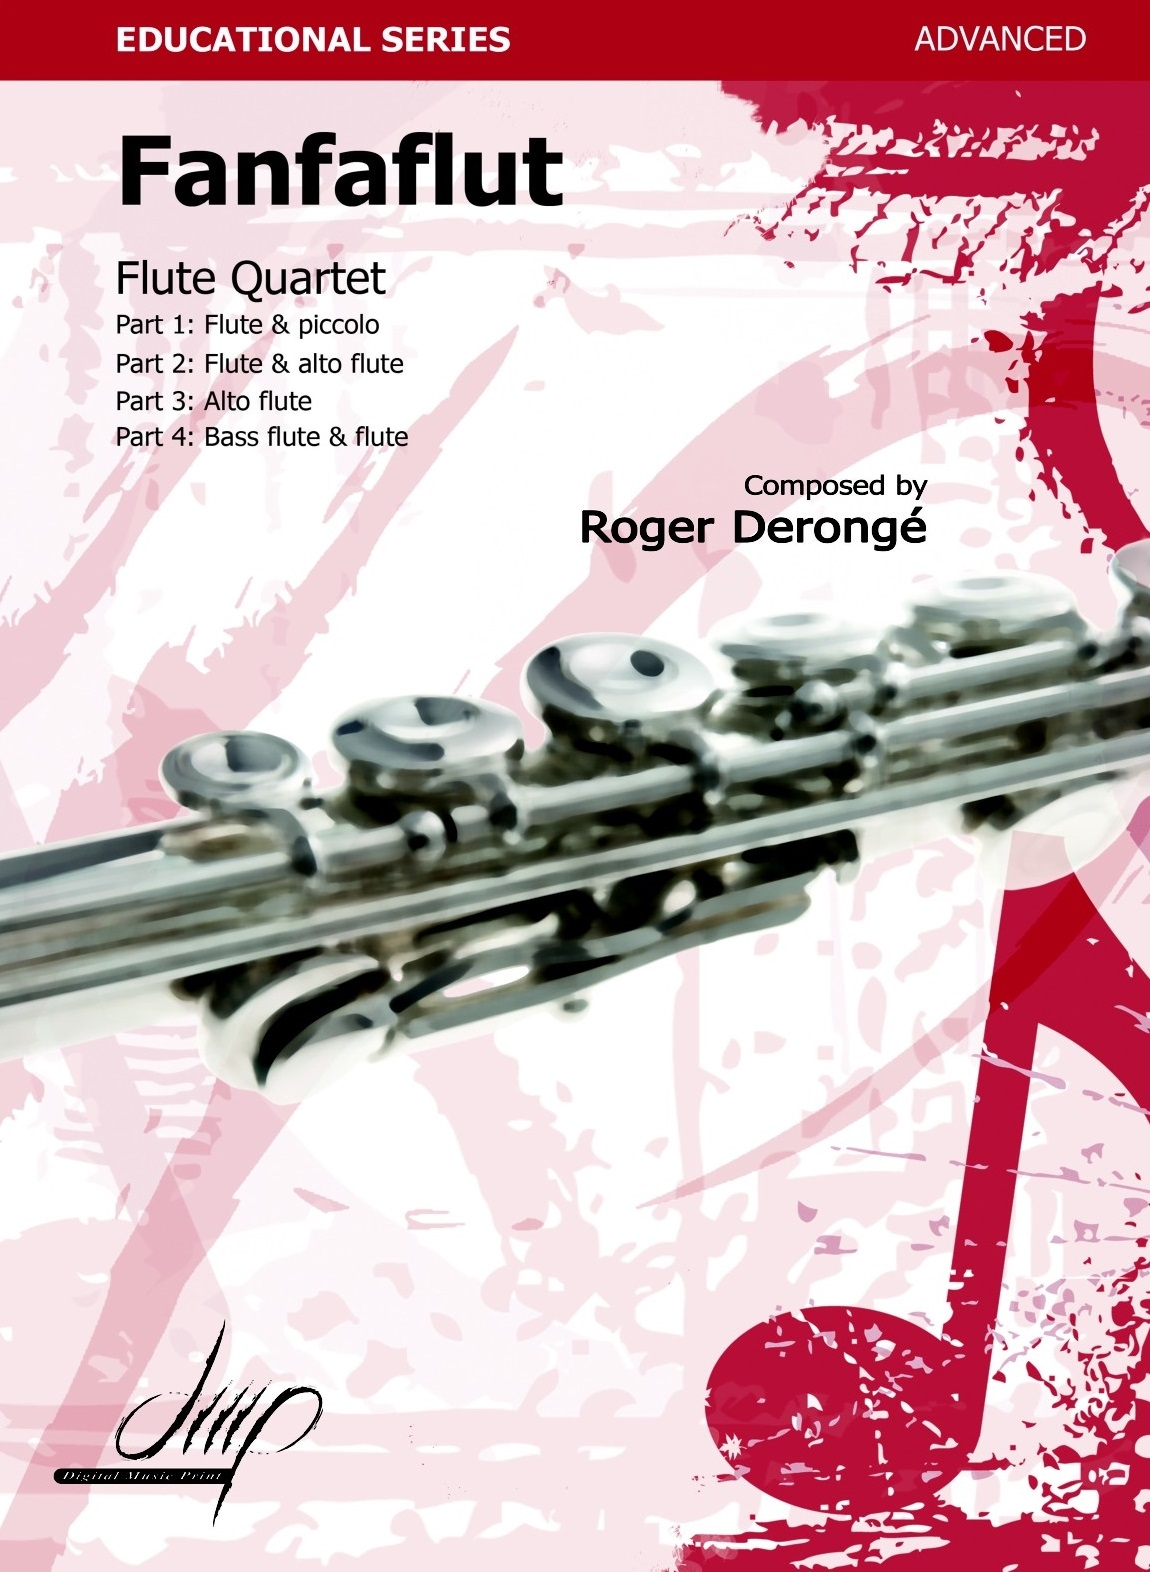 Roger Derongé - Fanfaflut (Digital Music Print)